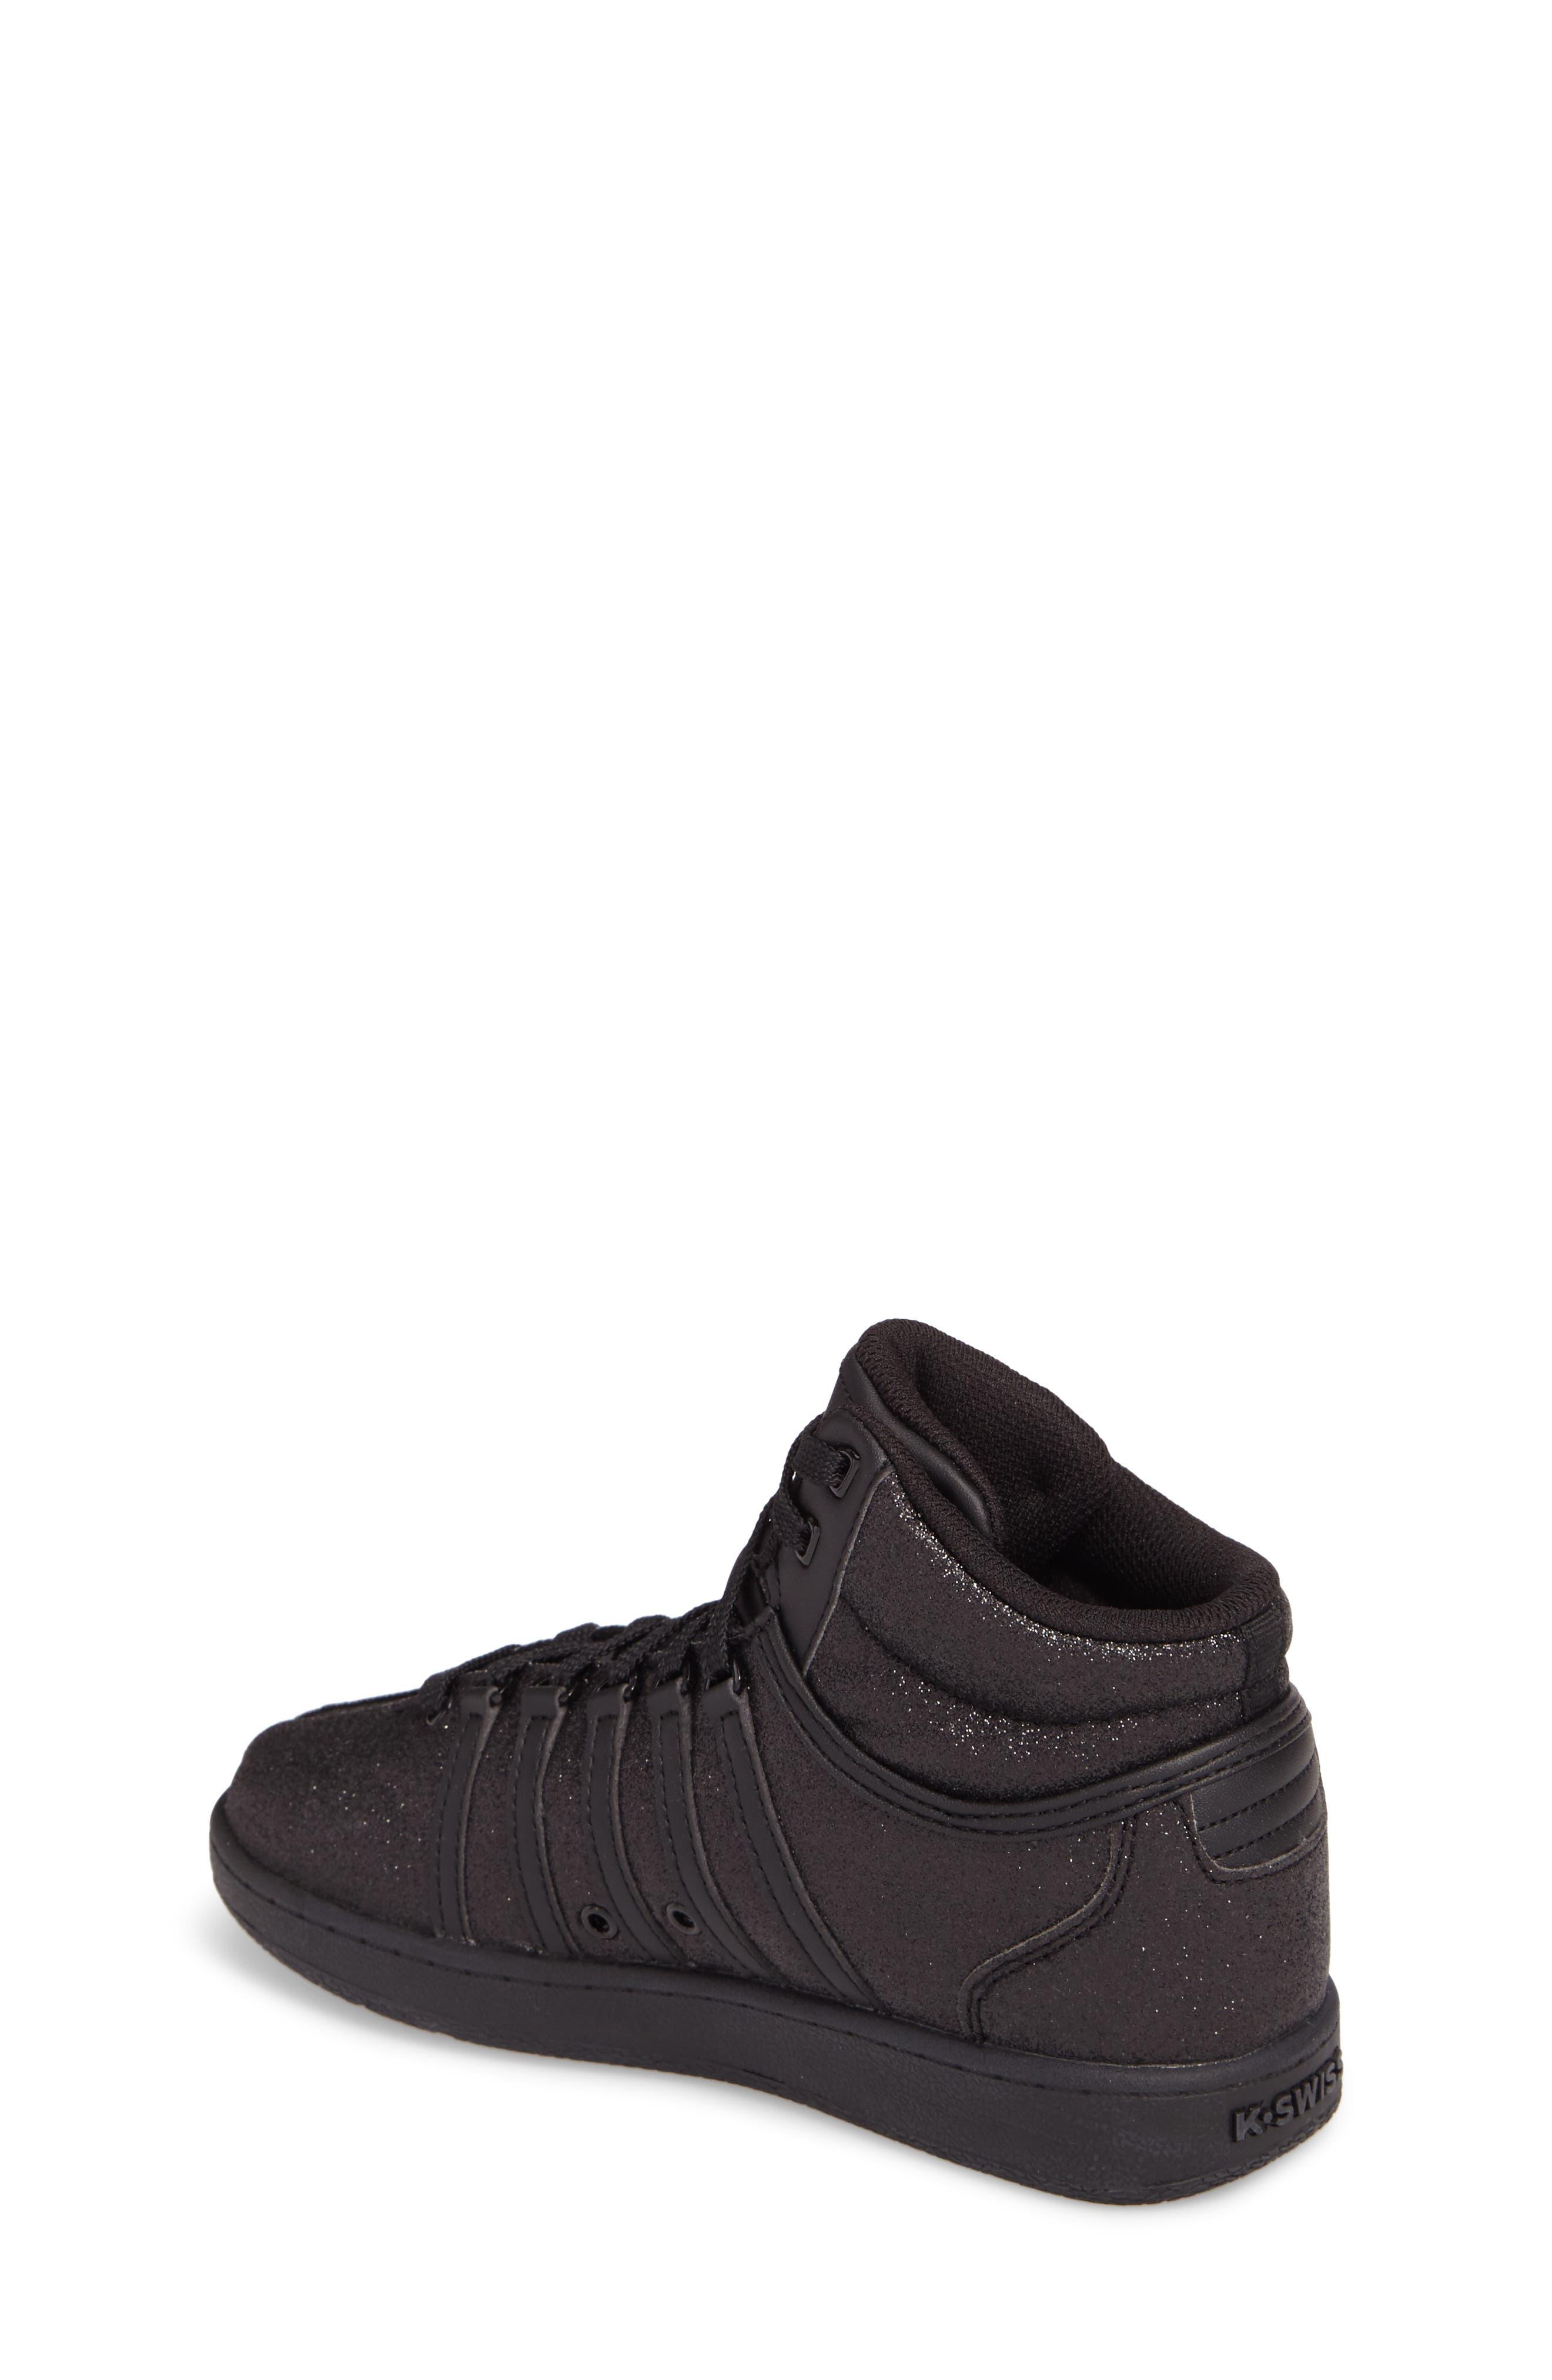 Classic VN Sparkle Mid Sneaker,                             Alternate thumbnail 2, color,                             014